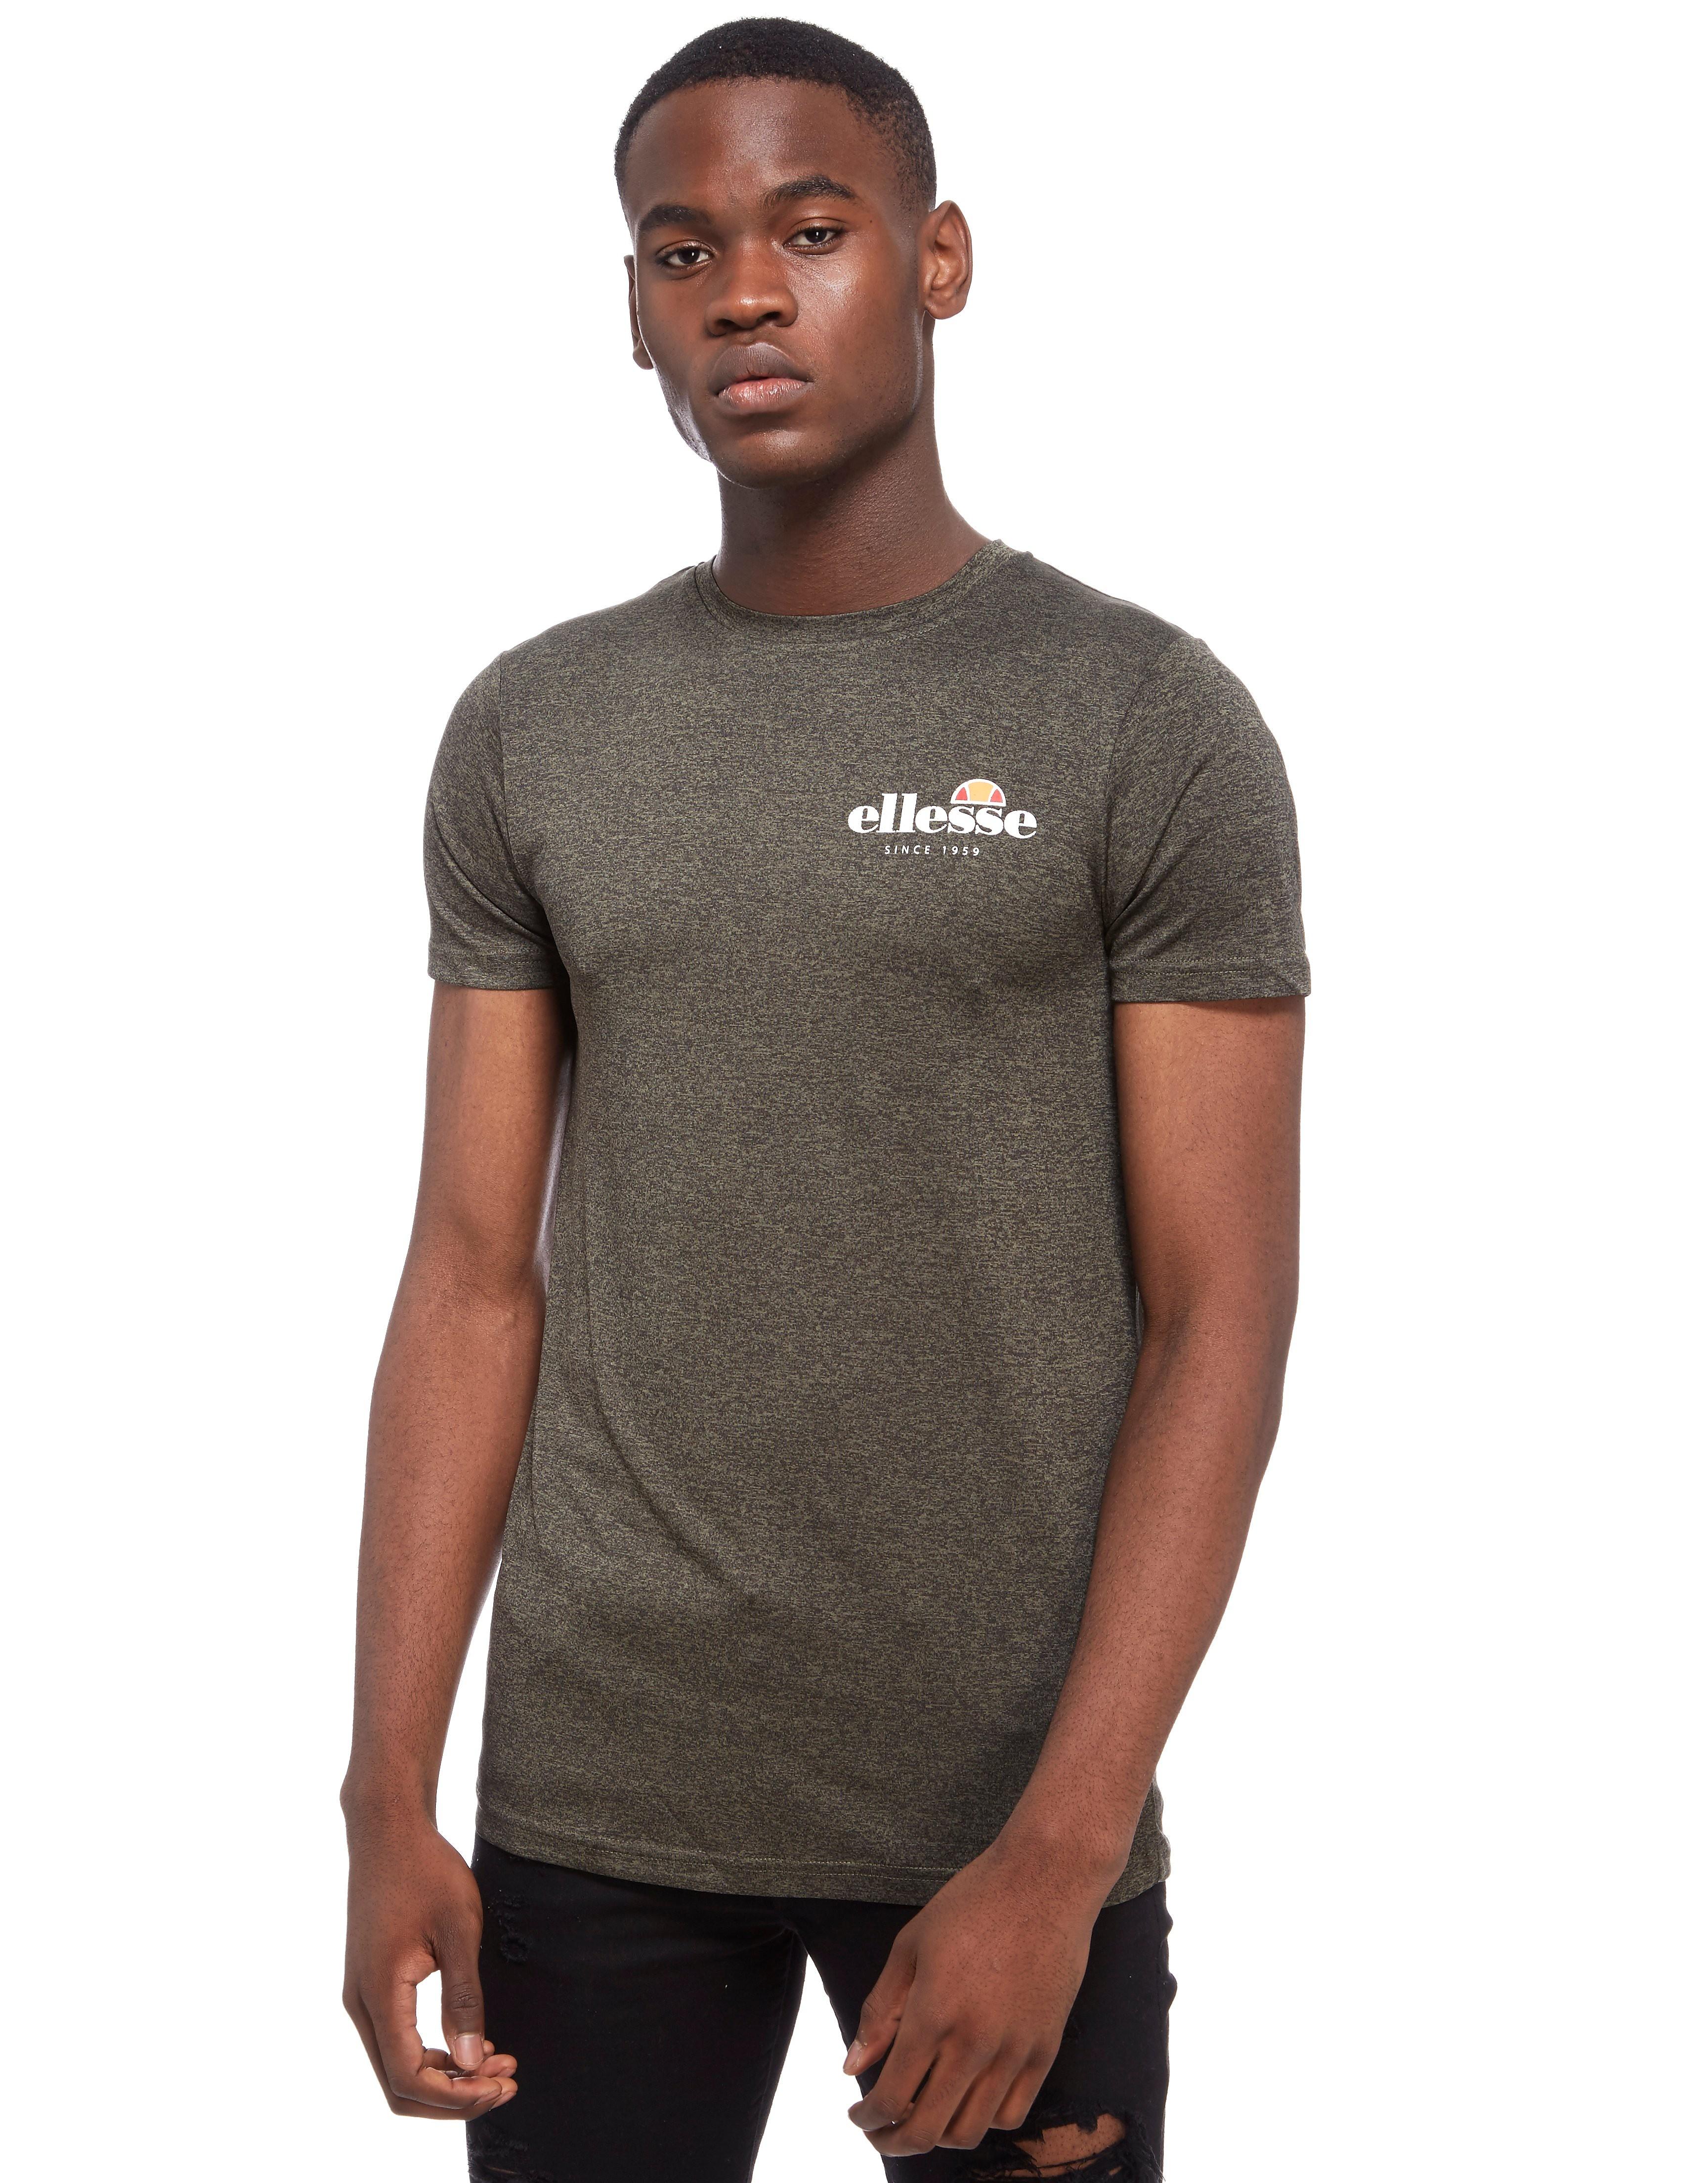 Ellesse Prino T-Shirt